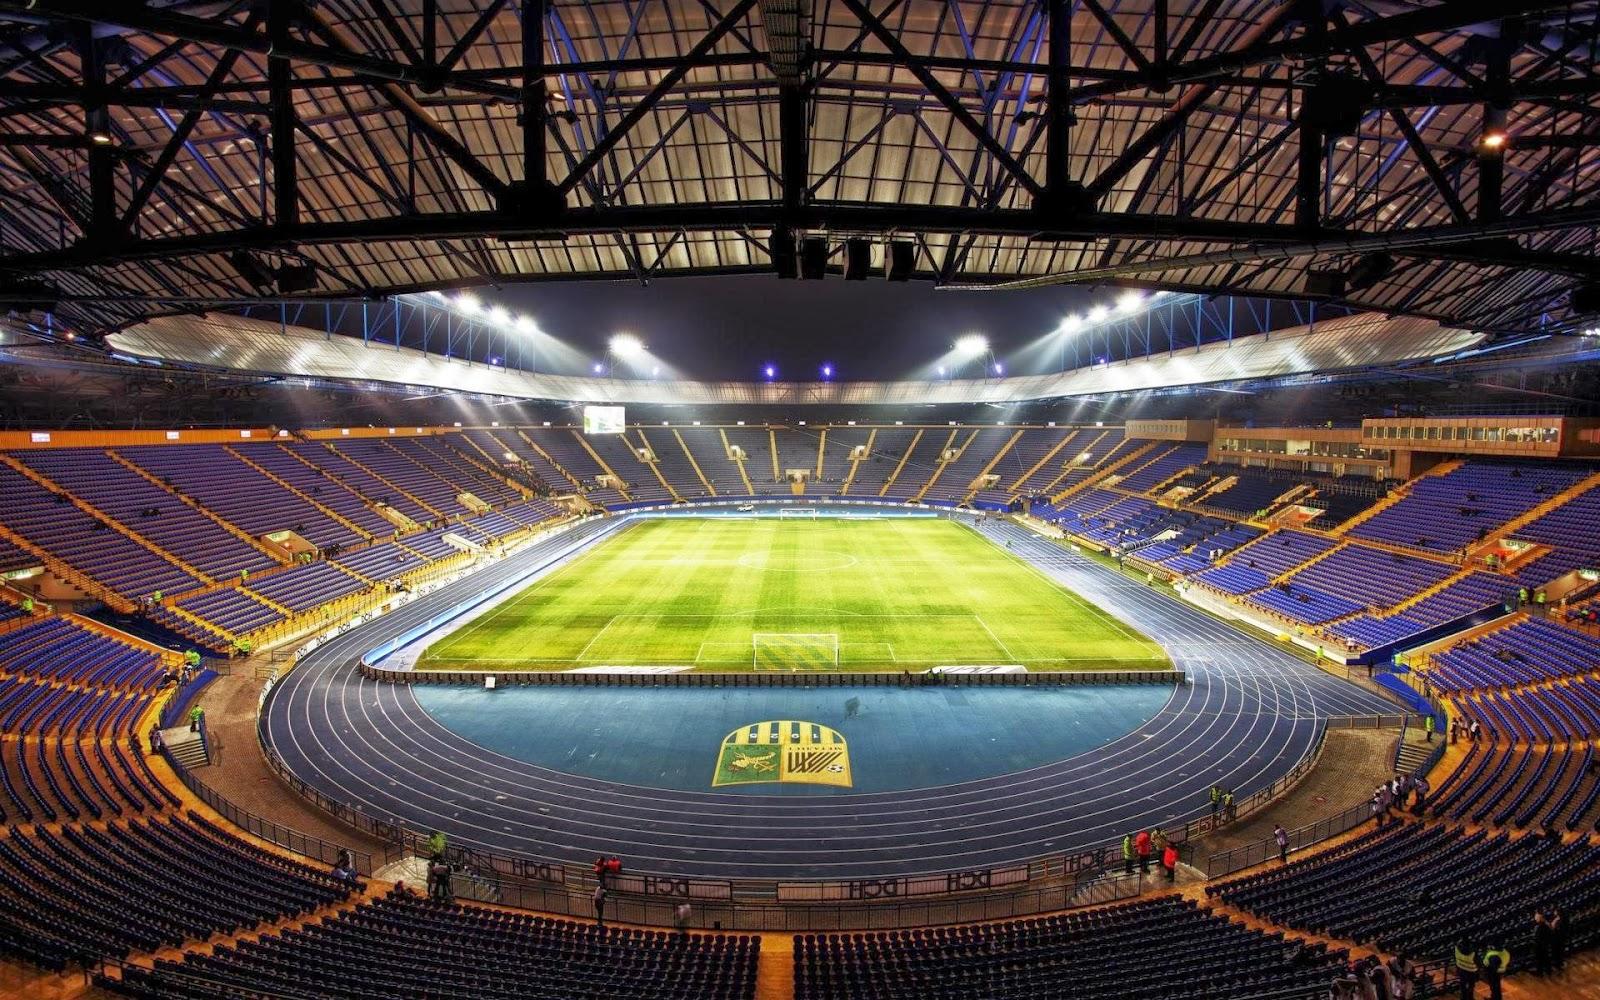 "<img src=""http://1.bp.blogspot.com/-93Kb-dCaksY/UuAfnrer_hI/AAAAAAAAJzg/oSpL1T5huPY/s1600/metalist-stadium-euro-football.jpg"" alt=""metalist stadium euro football"" />"